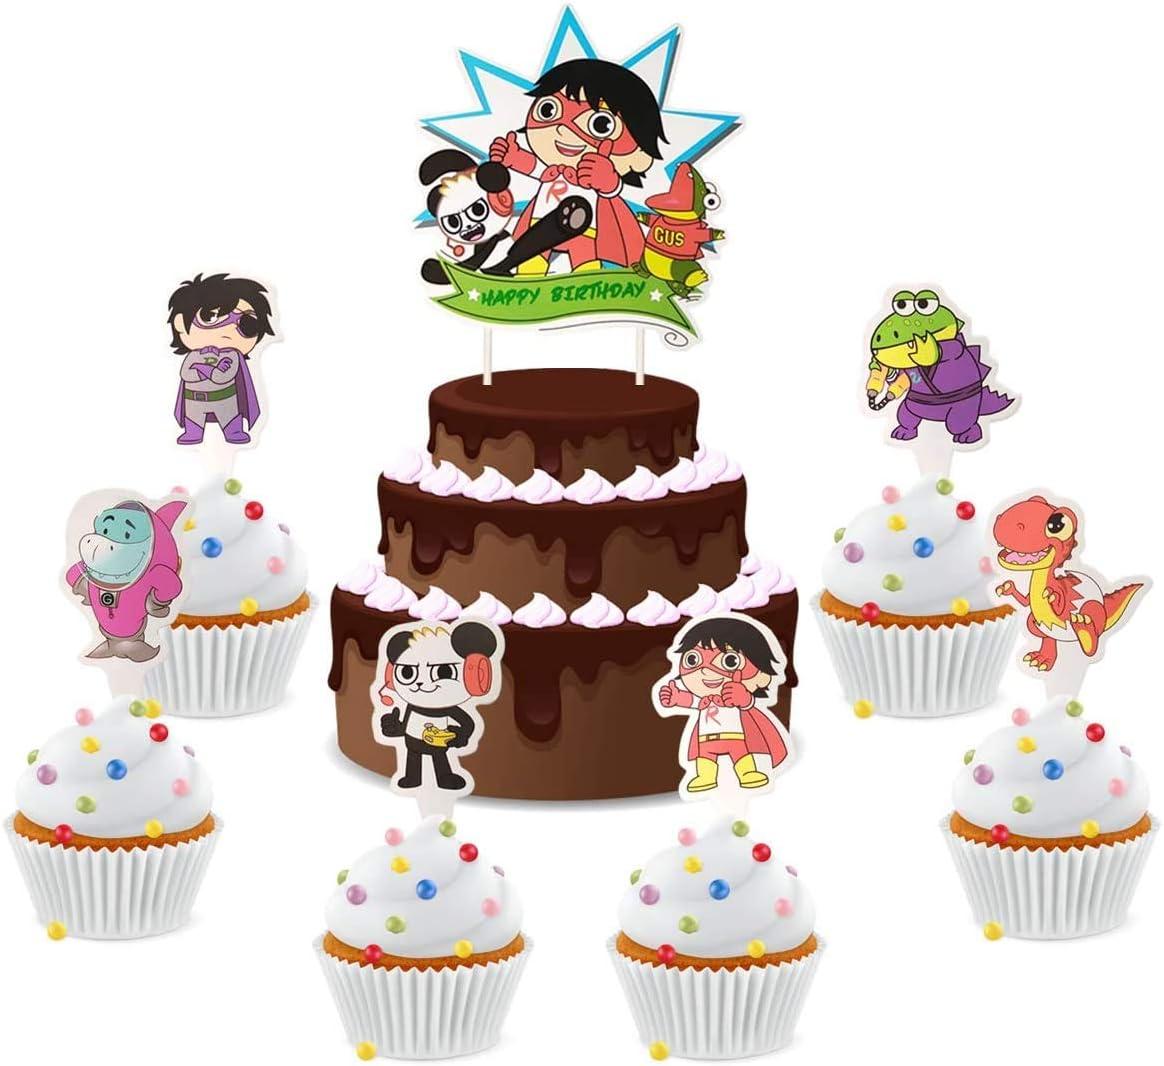 Ryans World Happy birthday cake topper children party supplies birthday party cake decorations 25pcs